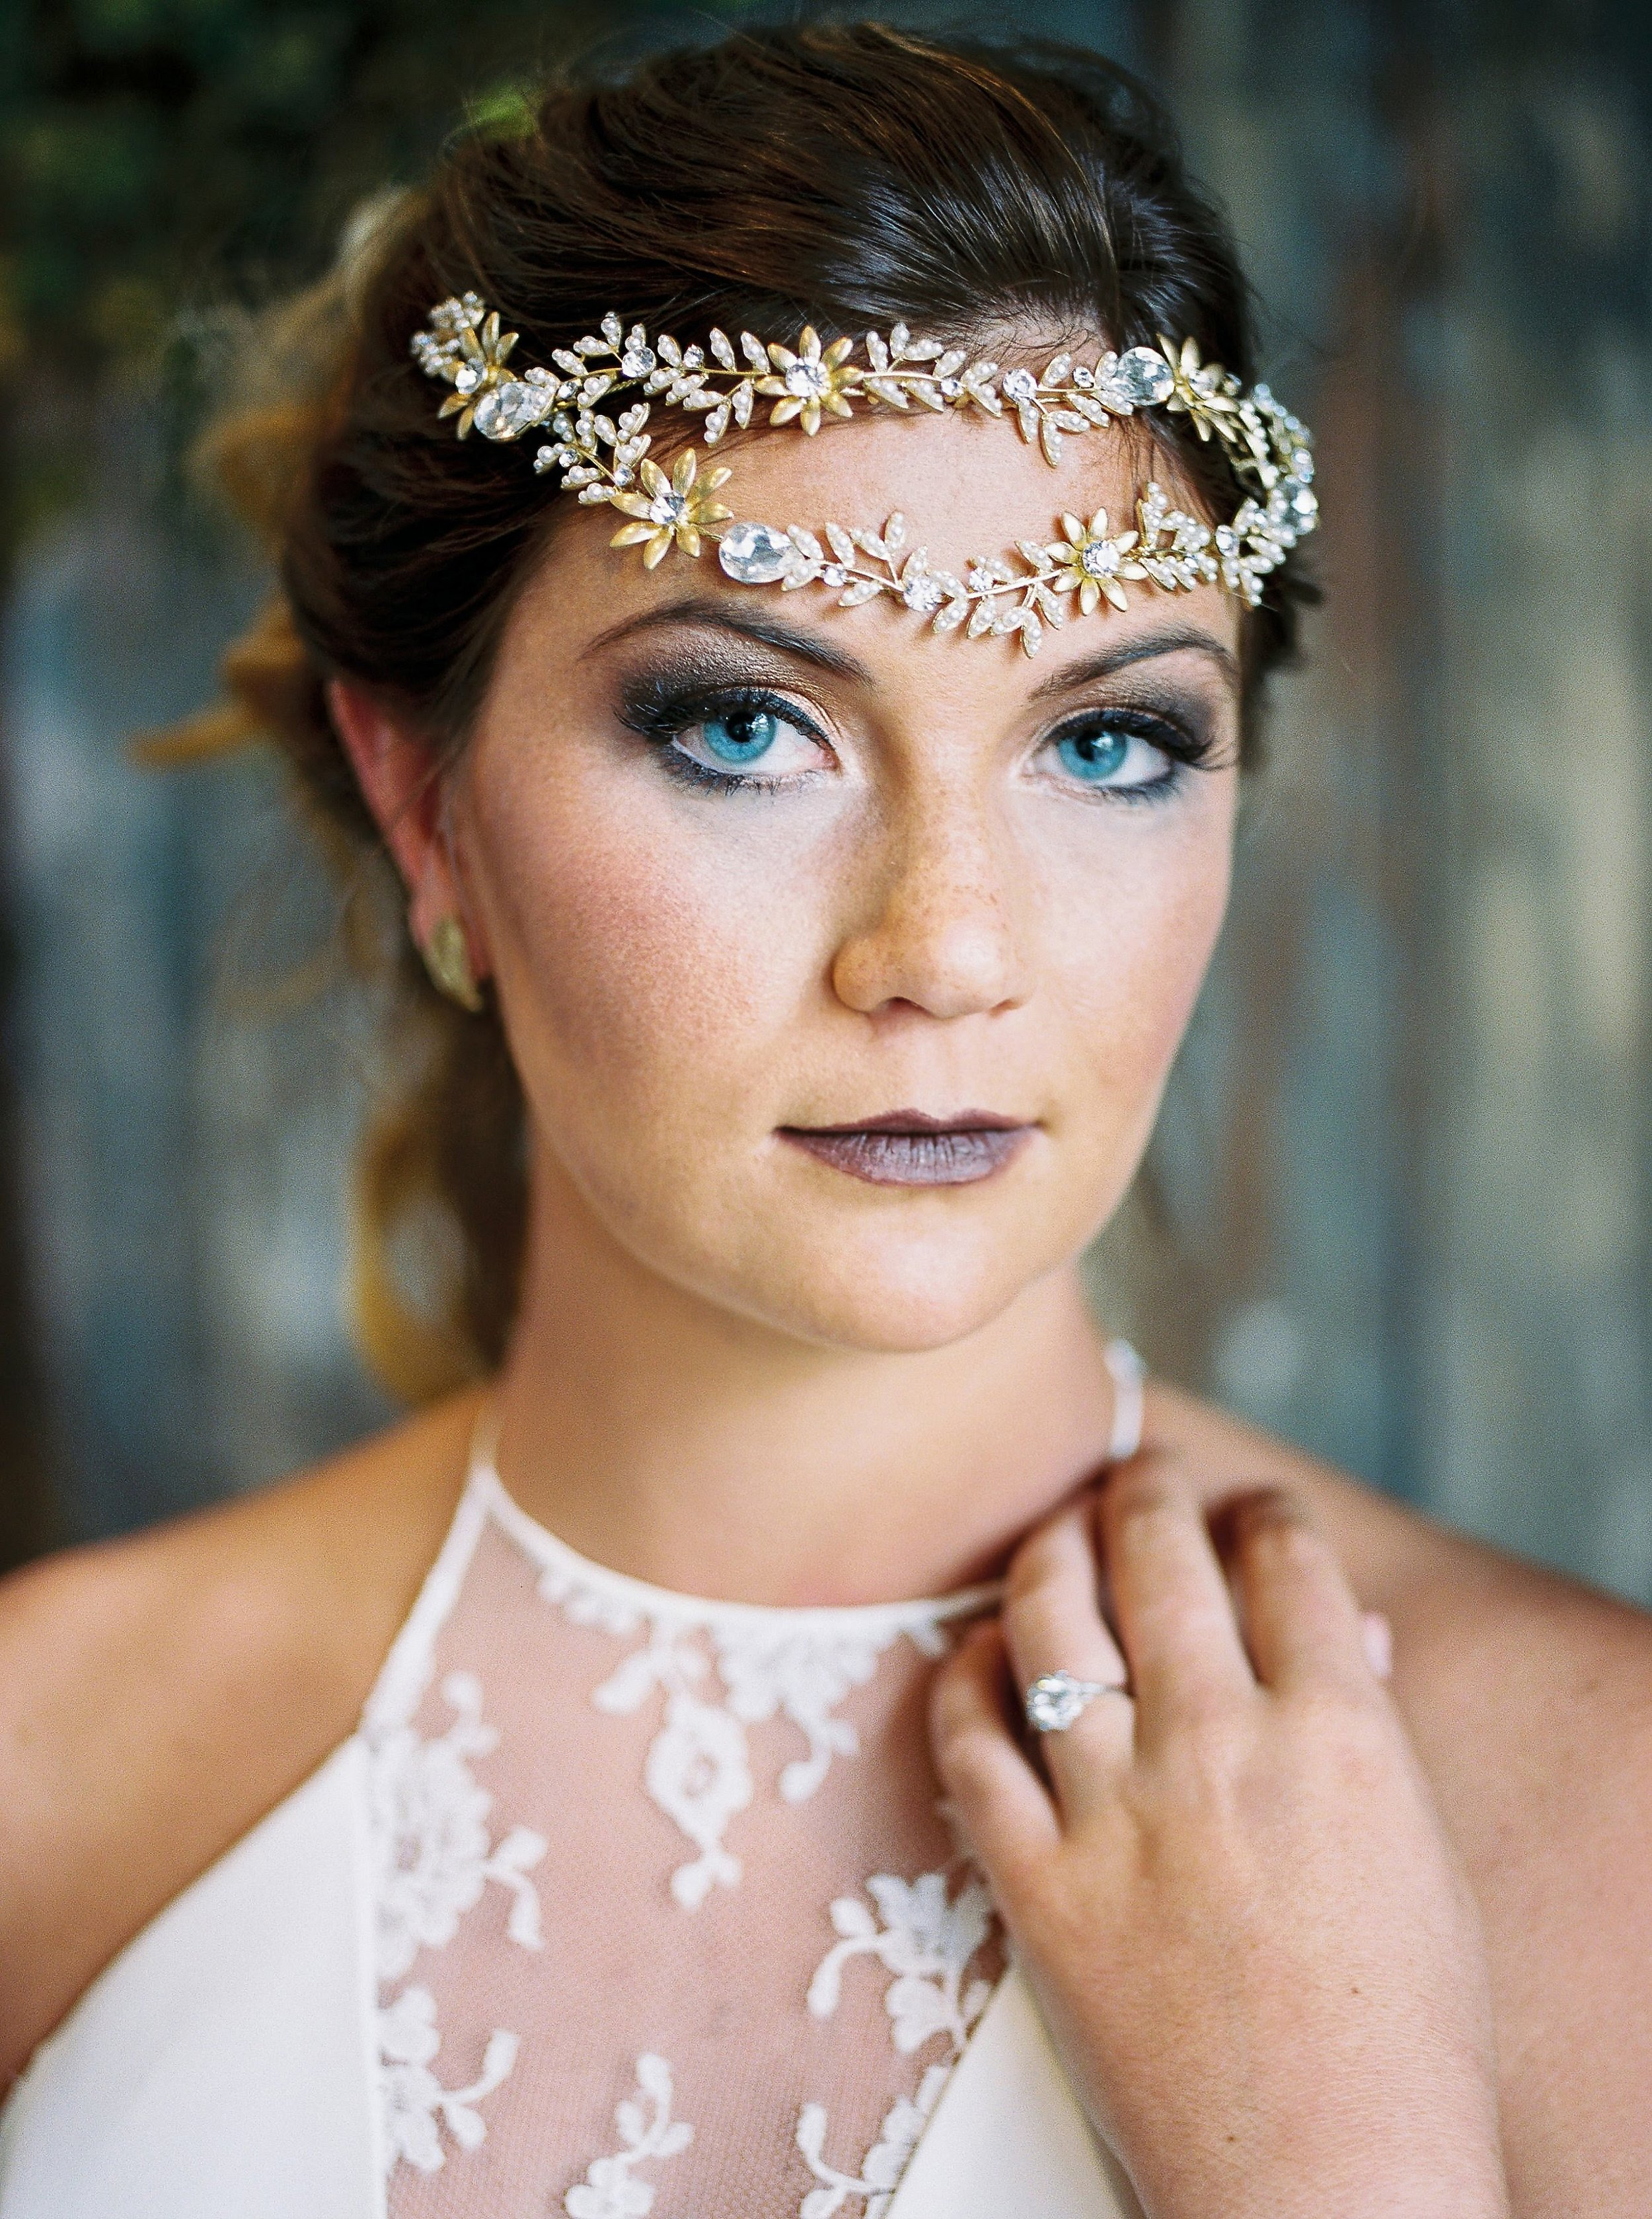 Alexandra-Elise-Photography-Ali-Reed-Film-Wedding-Photographer-Deerfield-Country-Club-131.jpg